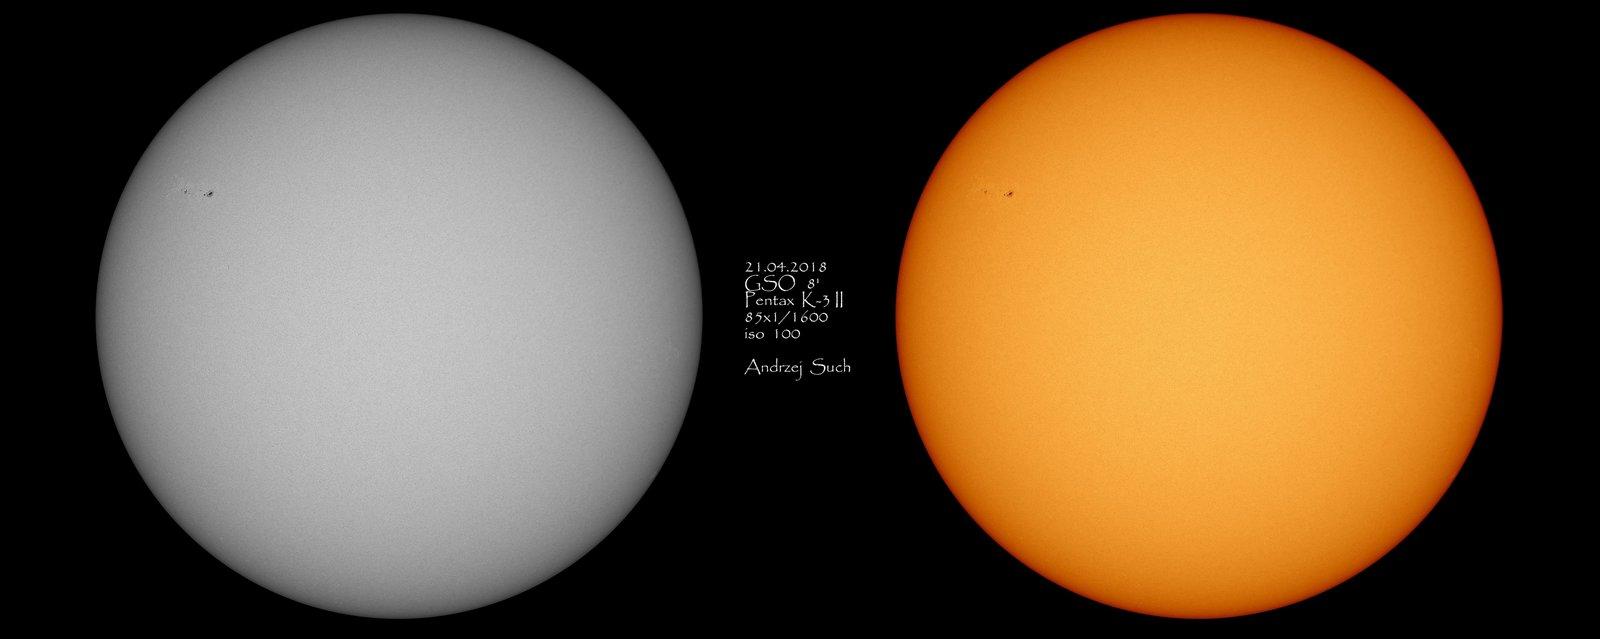 Słońce 21.04.2018 - Kopia.jpg